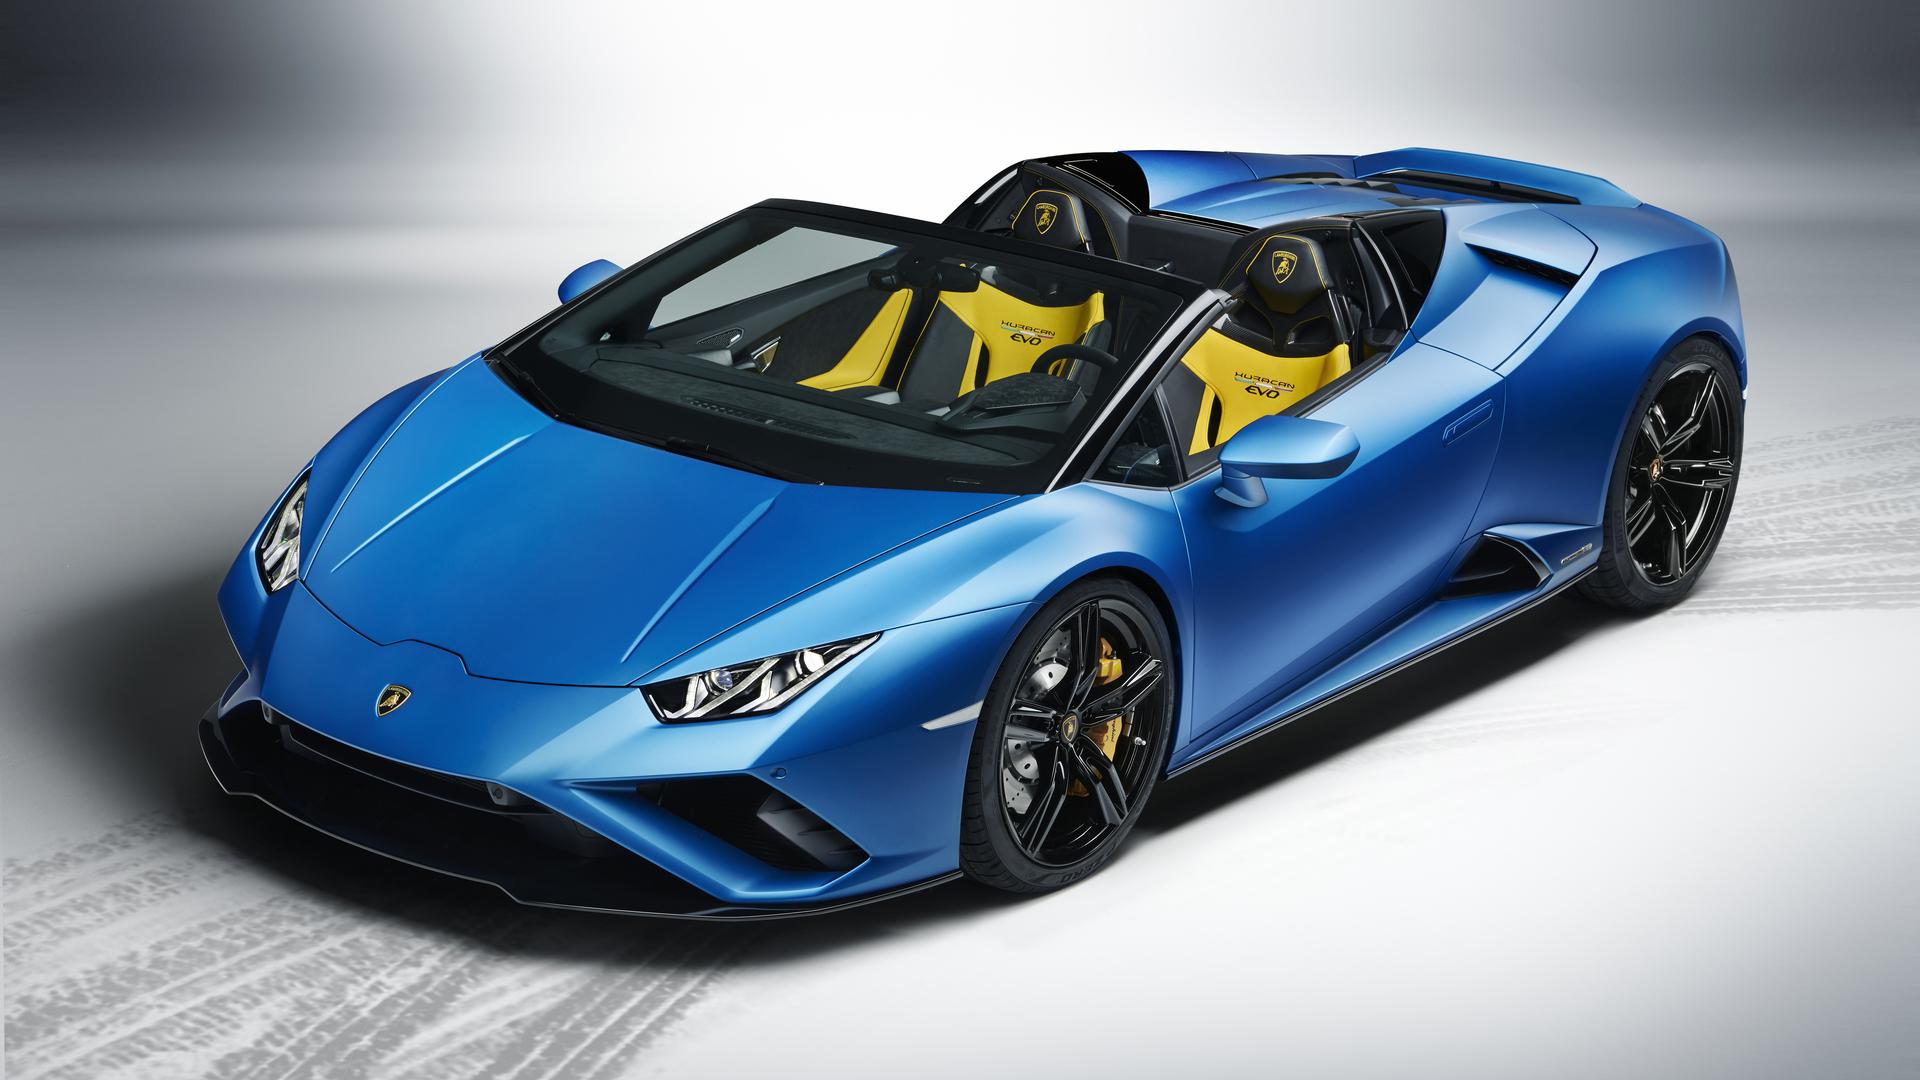 1920x1080 Lamborghini Huracan Evo Spyder 2020 New Laptop ...